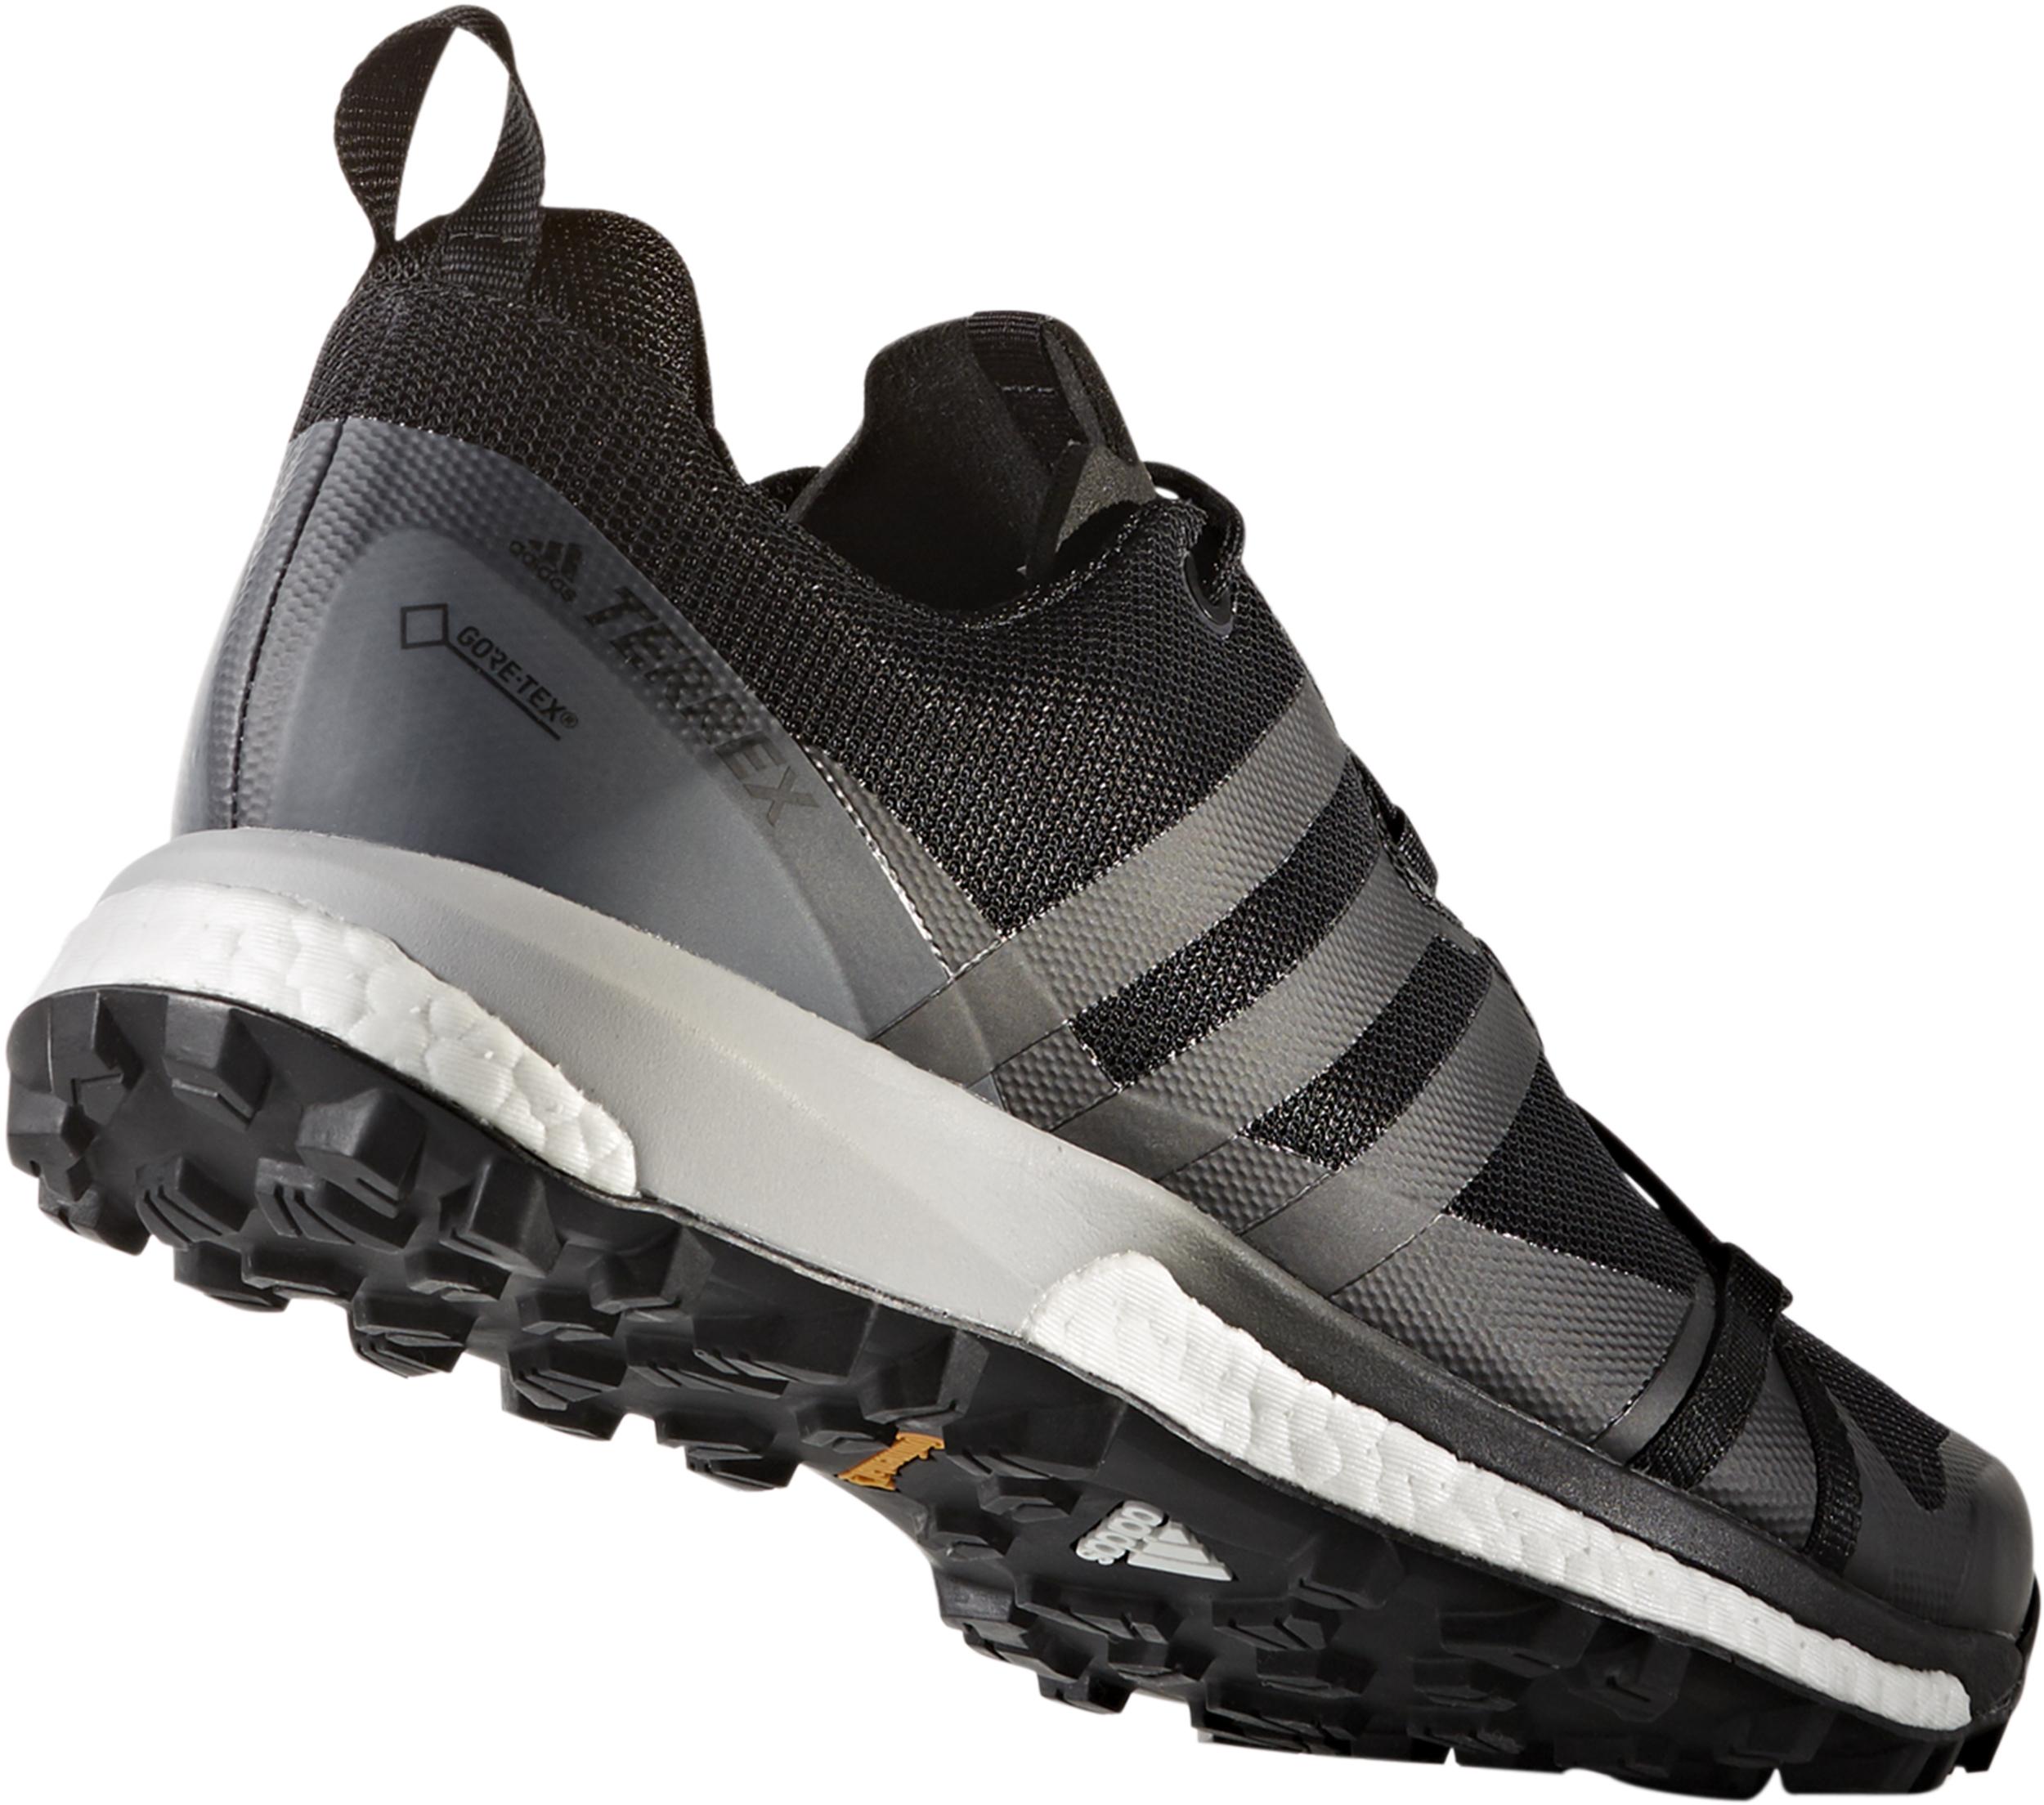 buy popular 820e4 ea730 Adidas Terrex Agravic GTX Trail Running Shoes - Mens